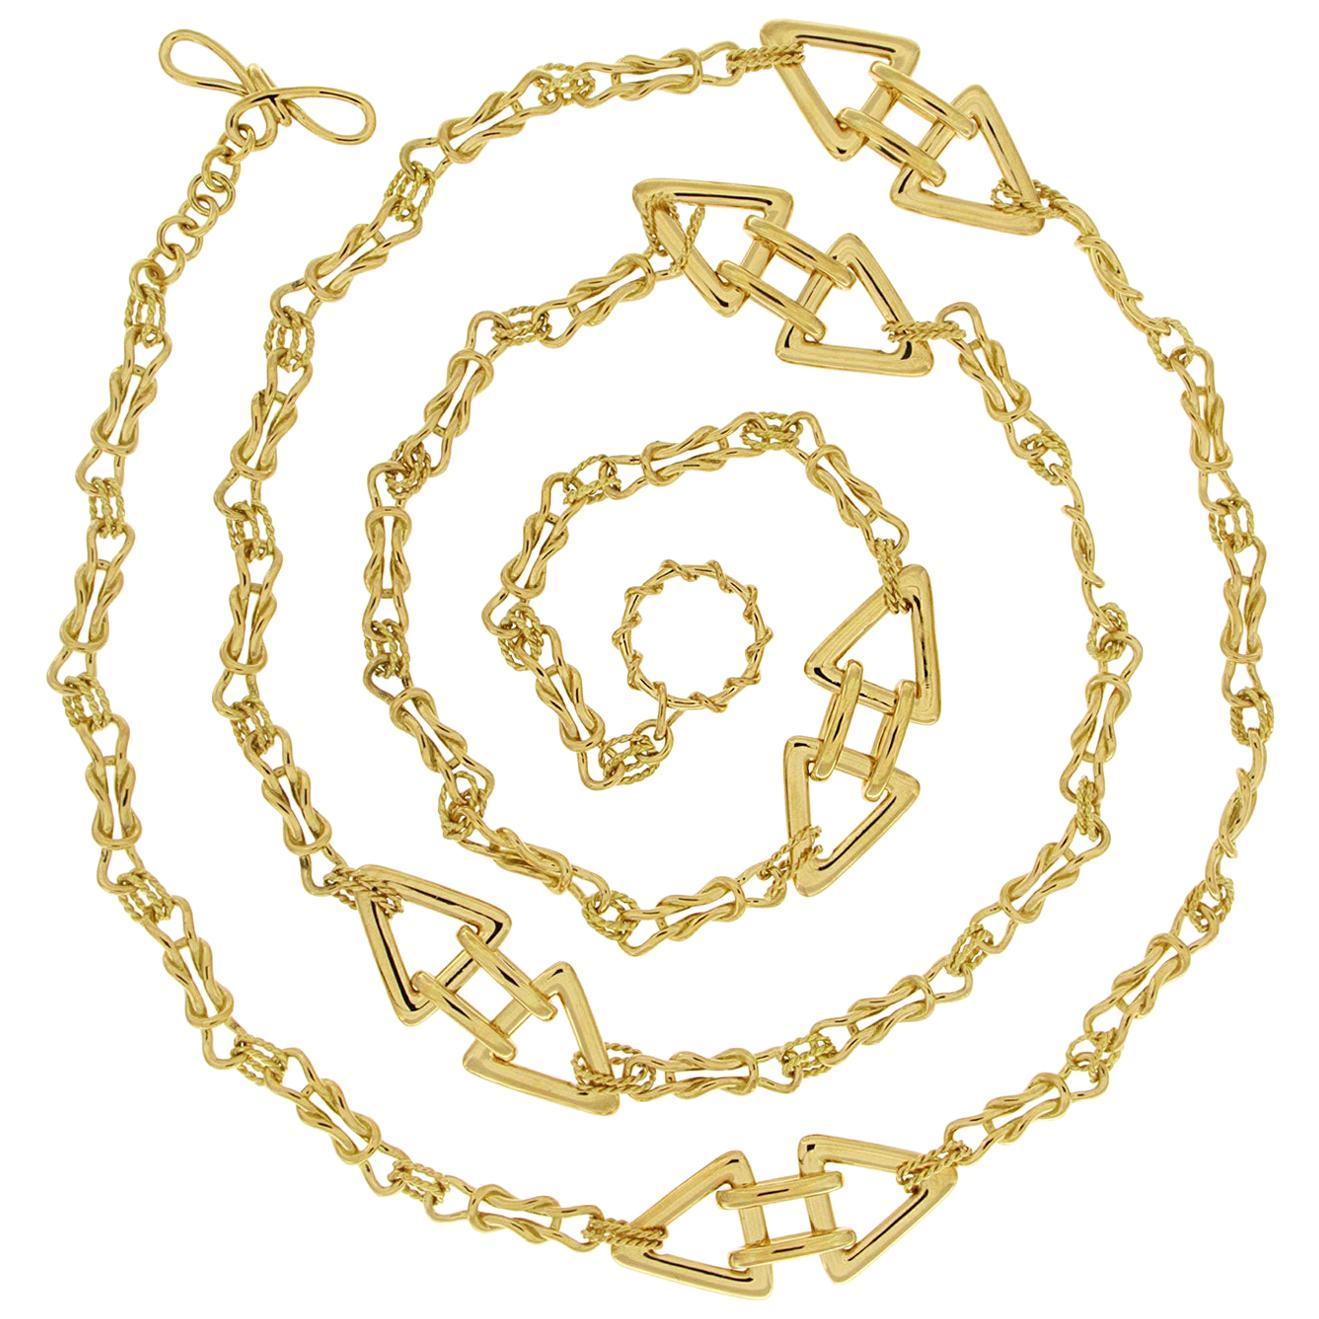 Valentin Magro Interlocking Mariner Knot Necklace